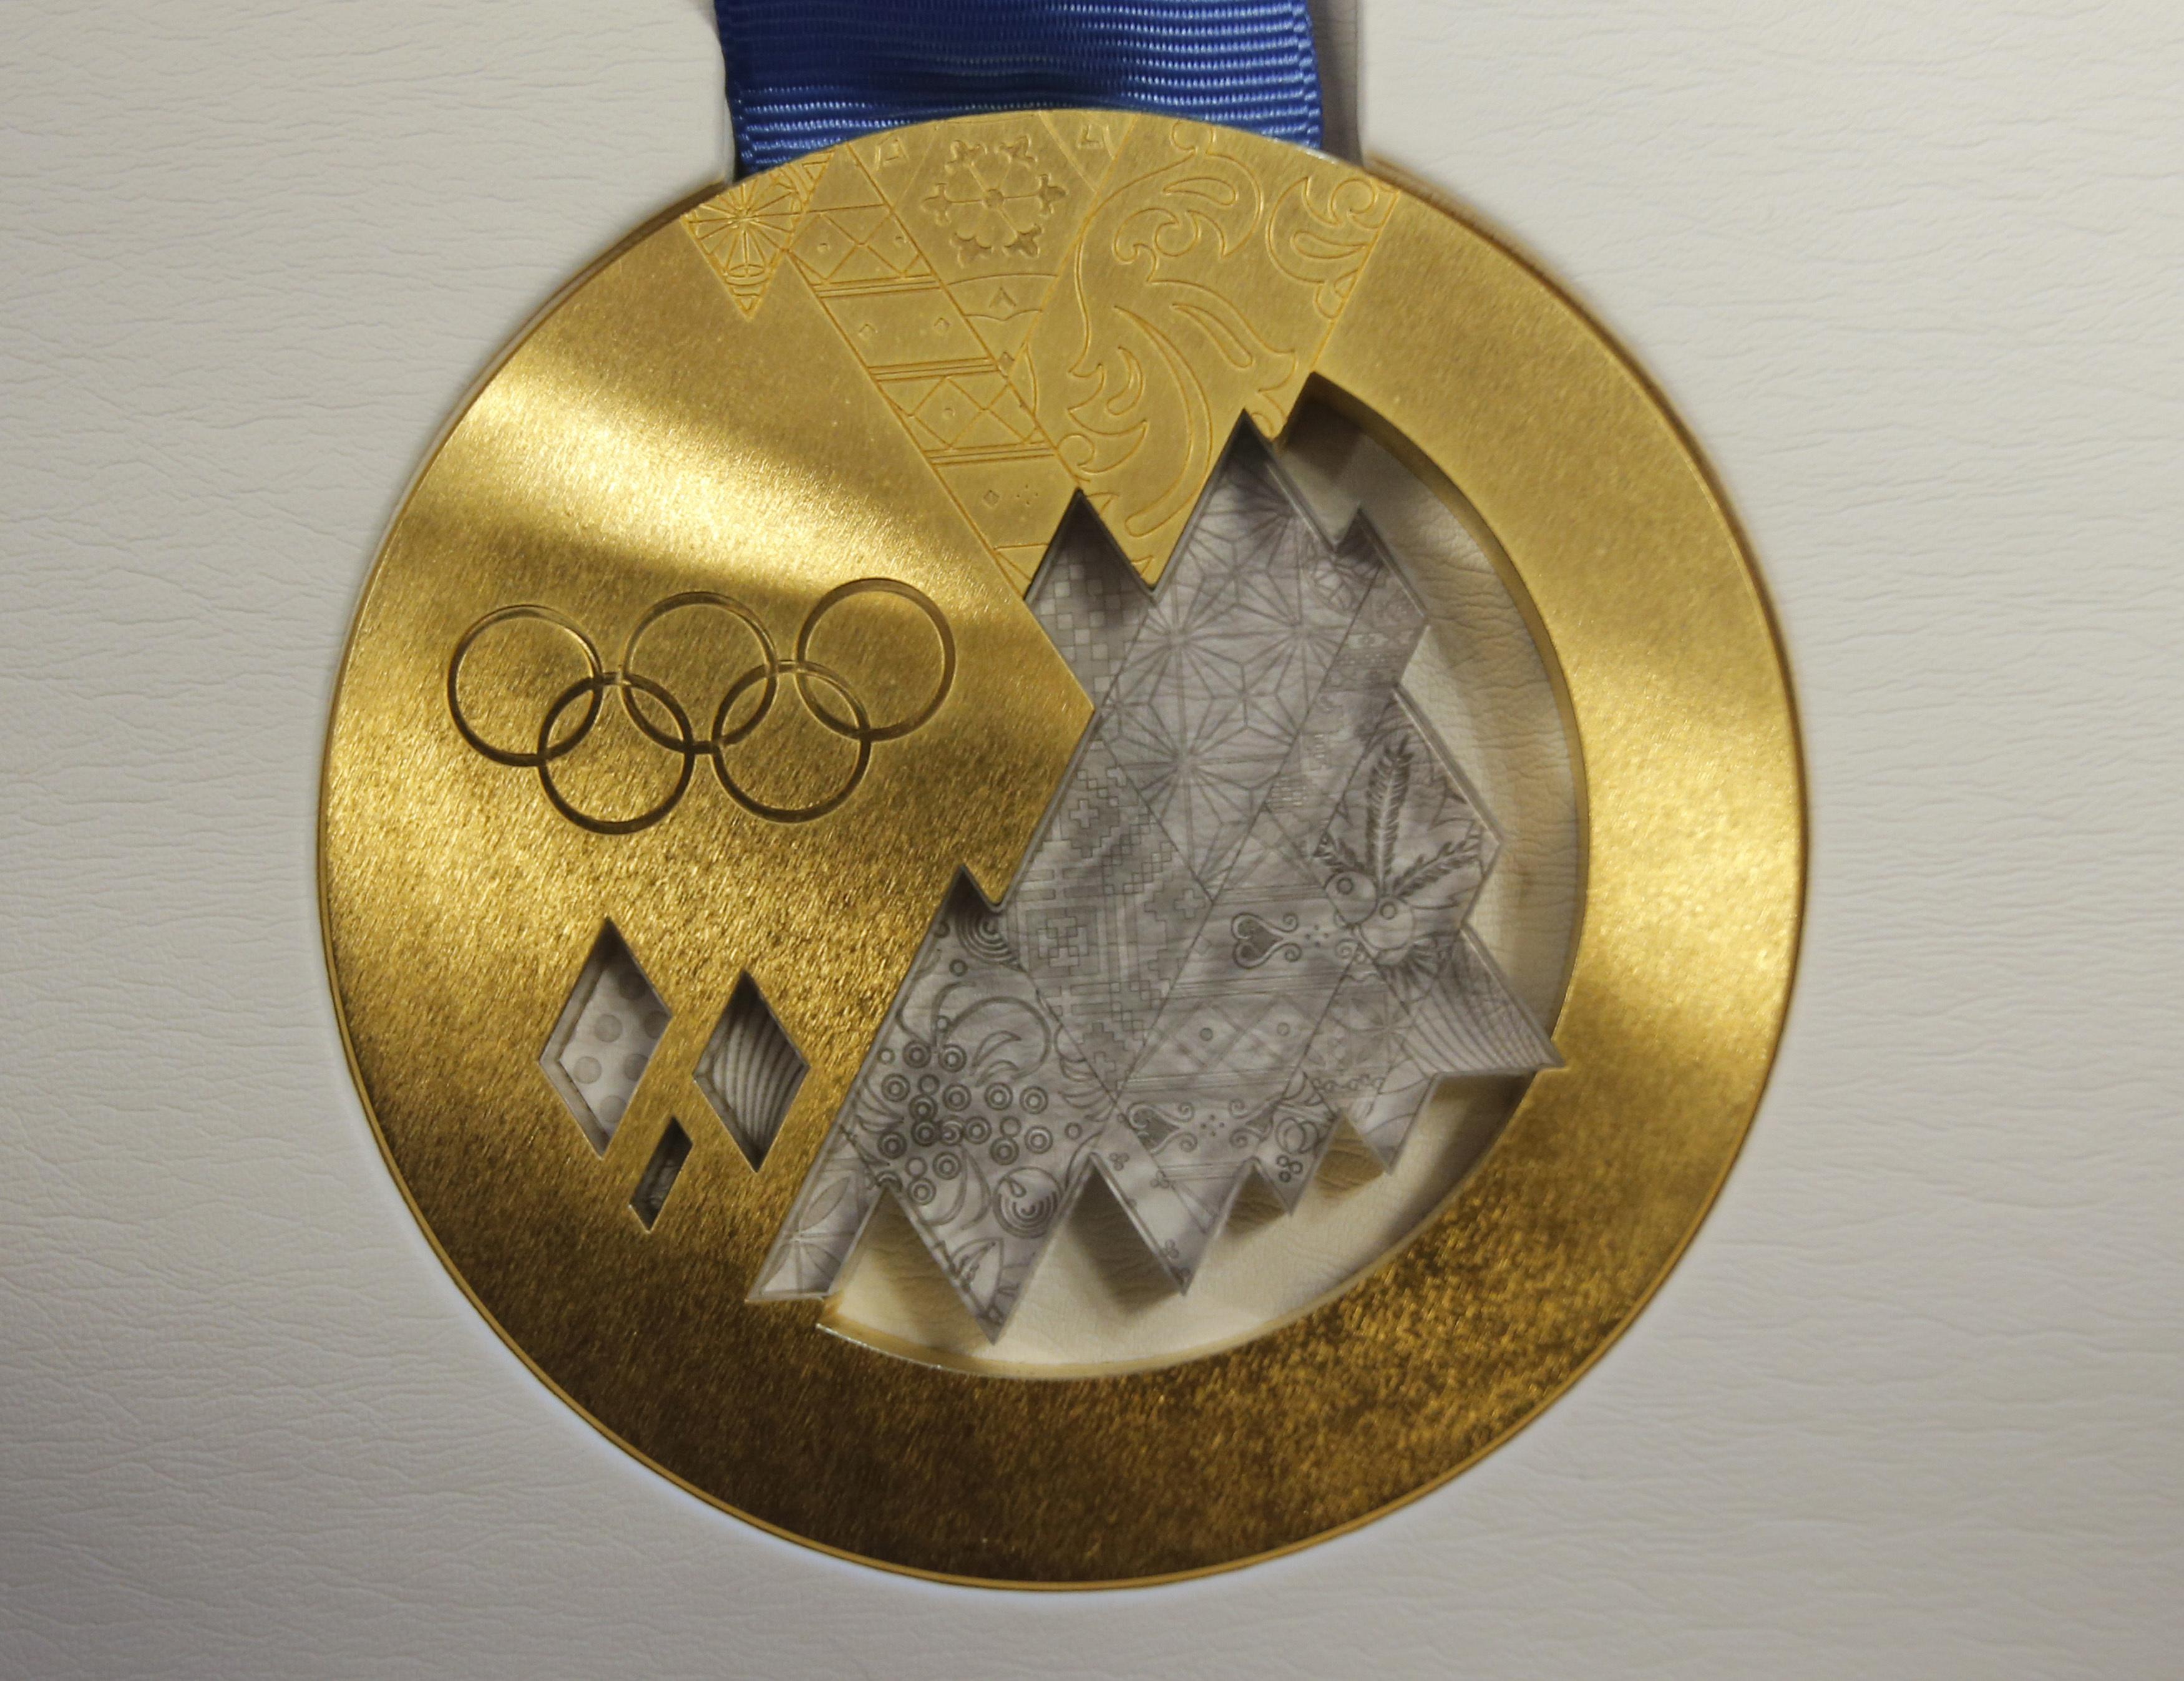 медали олимпийских игр фото фотки